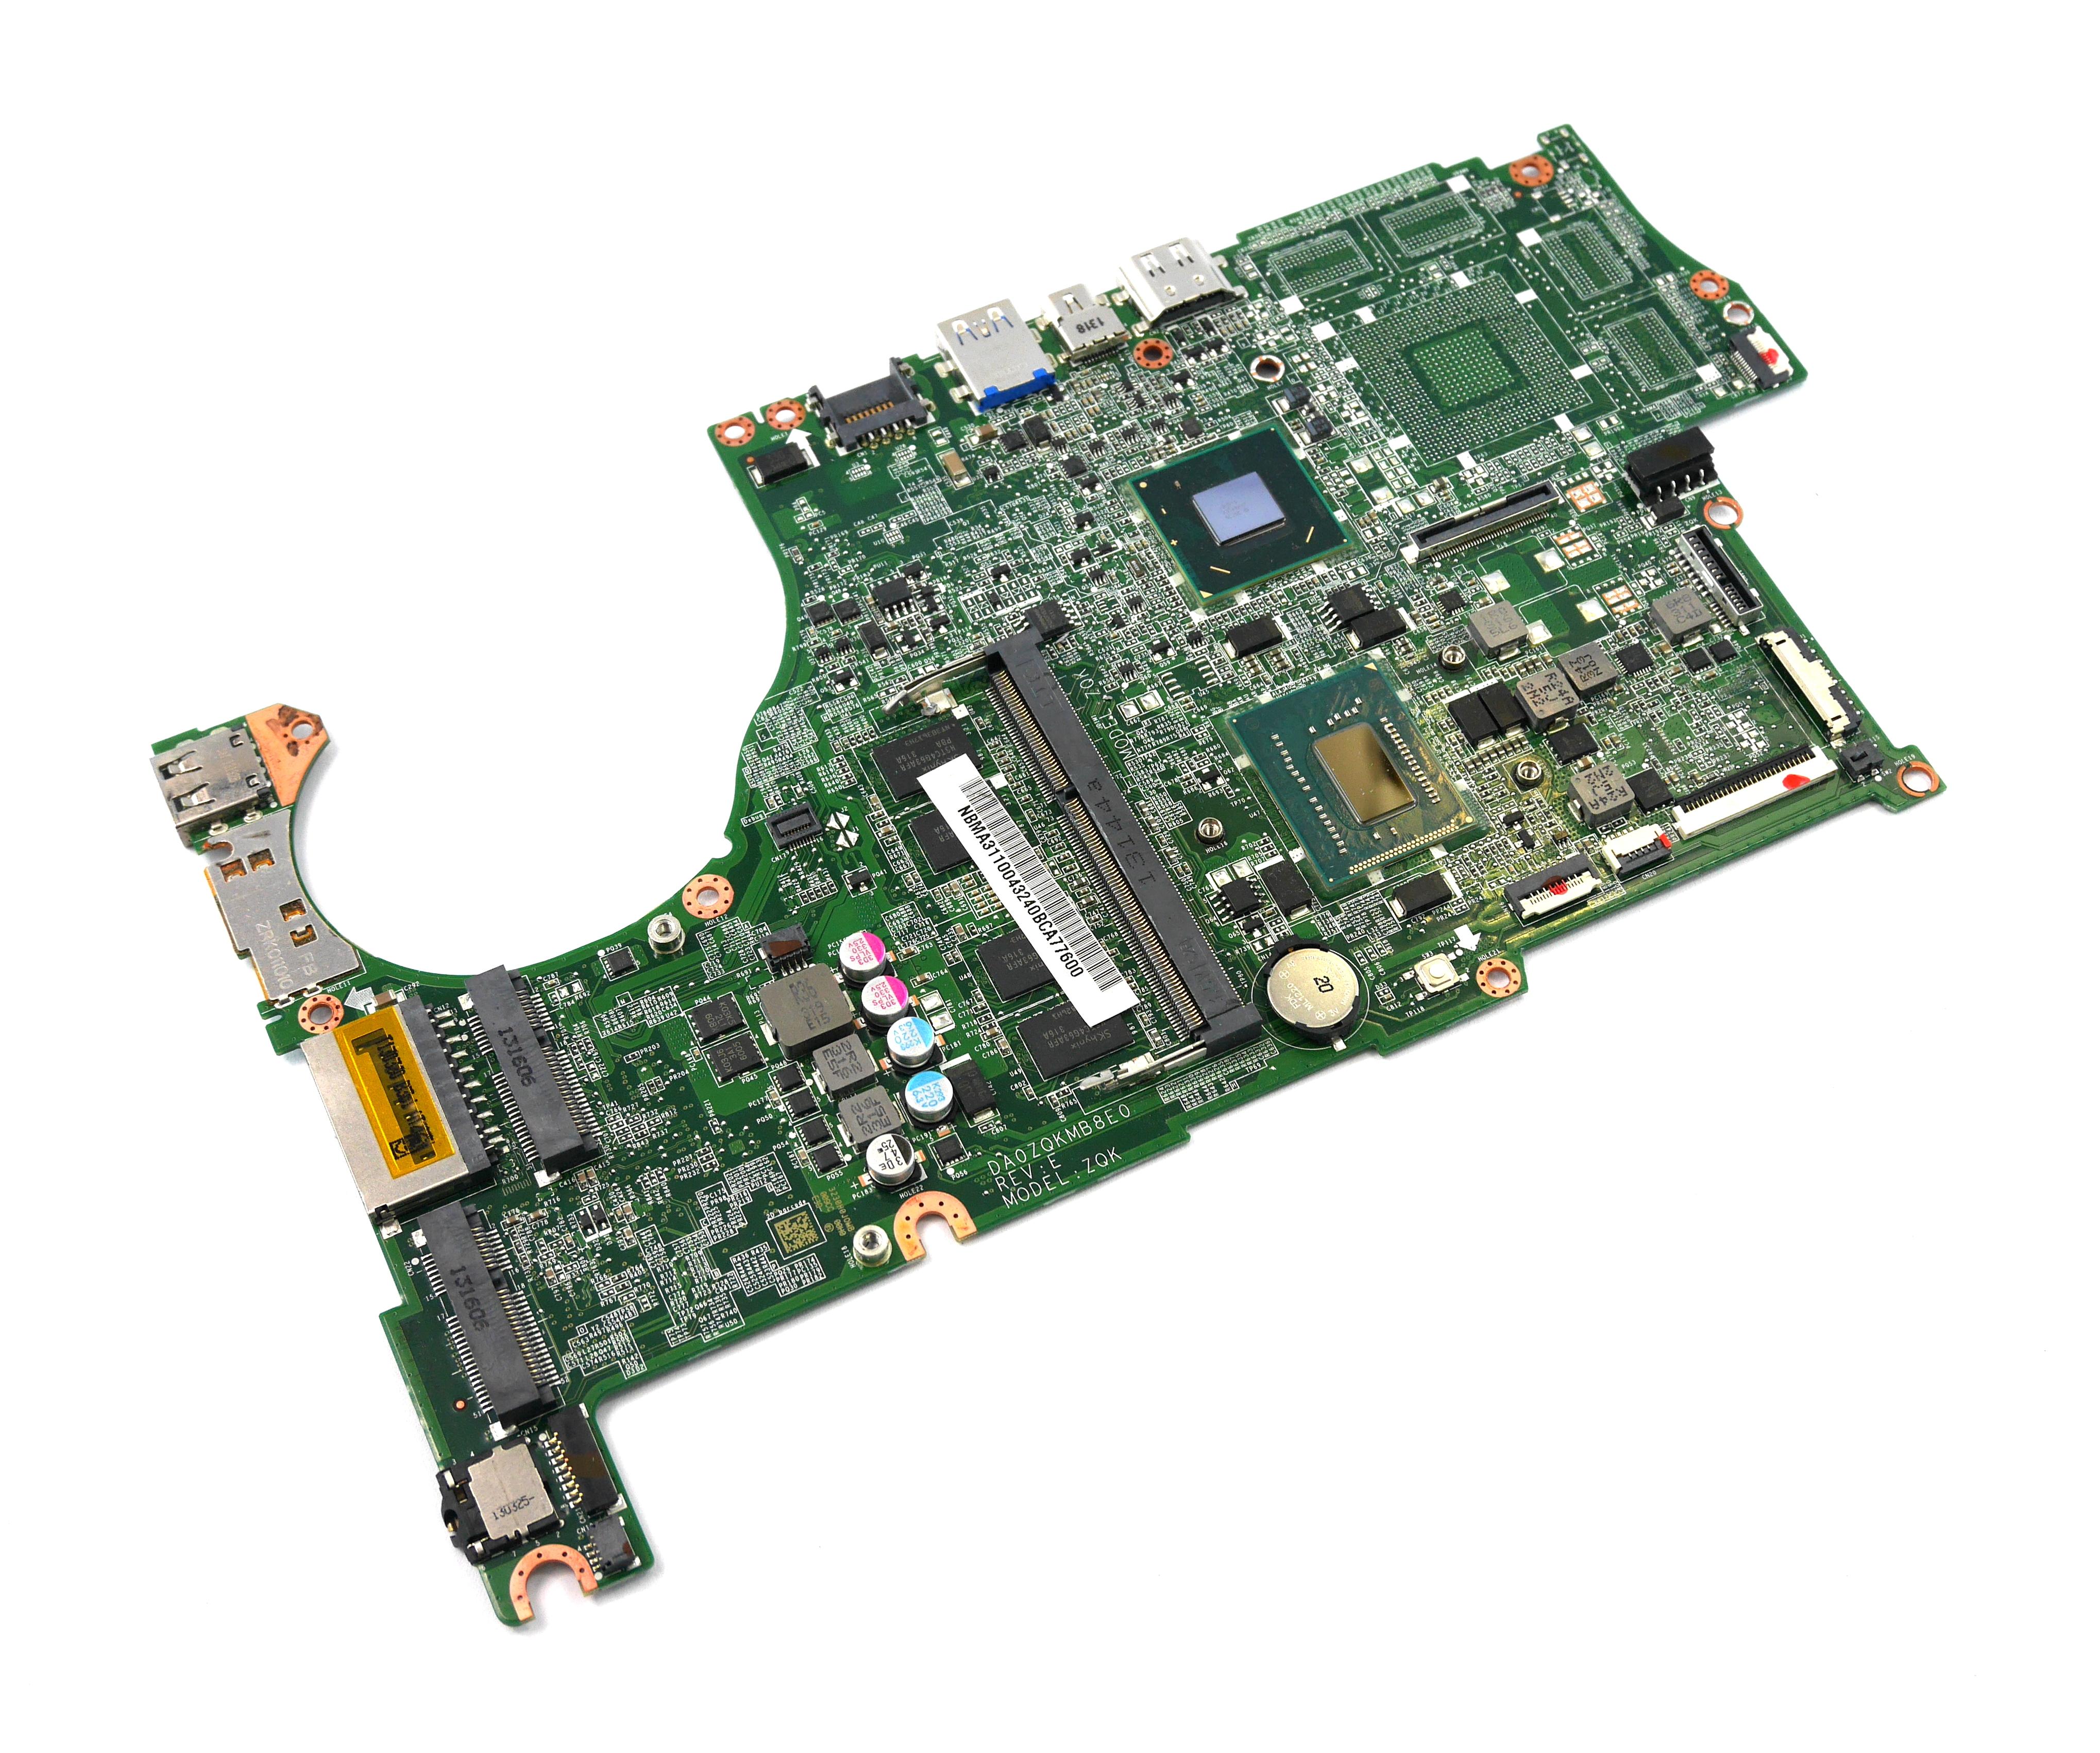 Acer NB.MA311.004 Aspire V5-572 Motherboard with Intel Core i5-3337U CPU